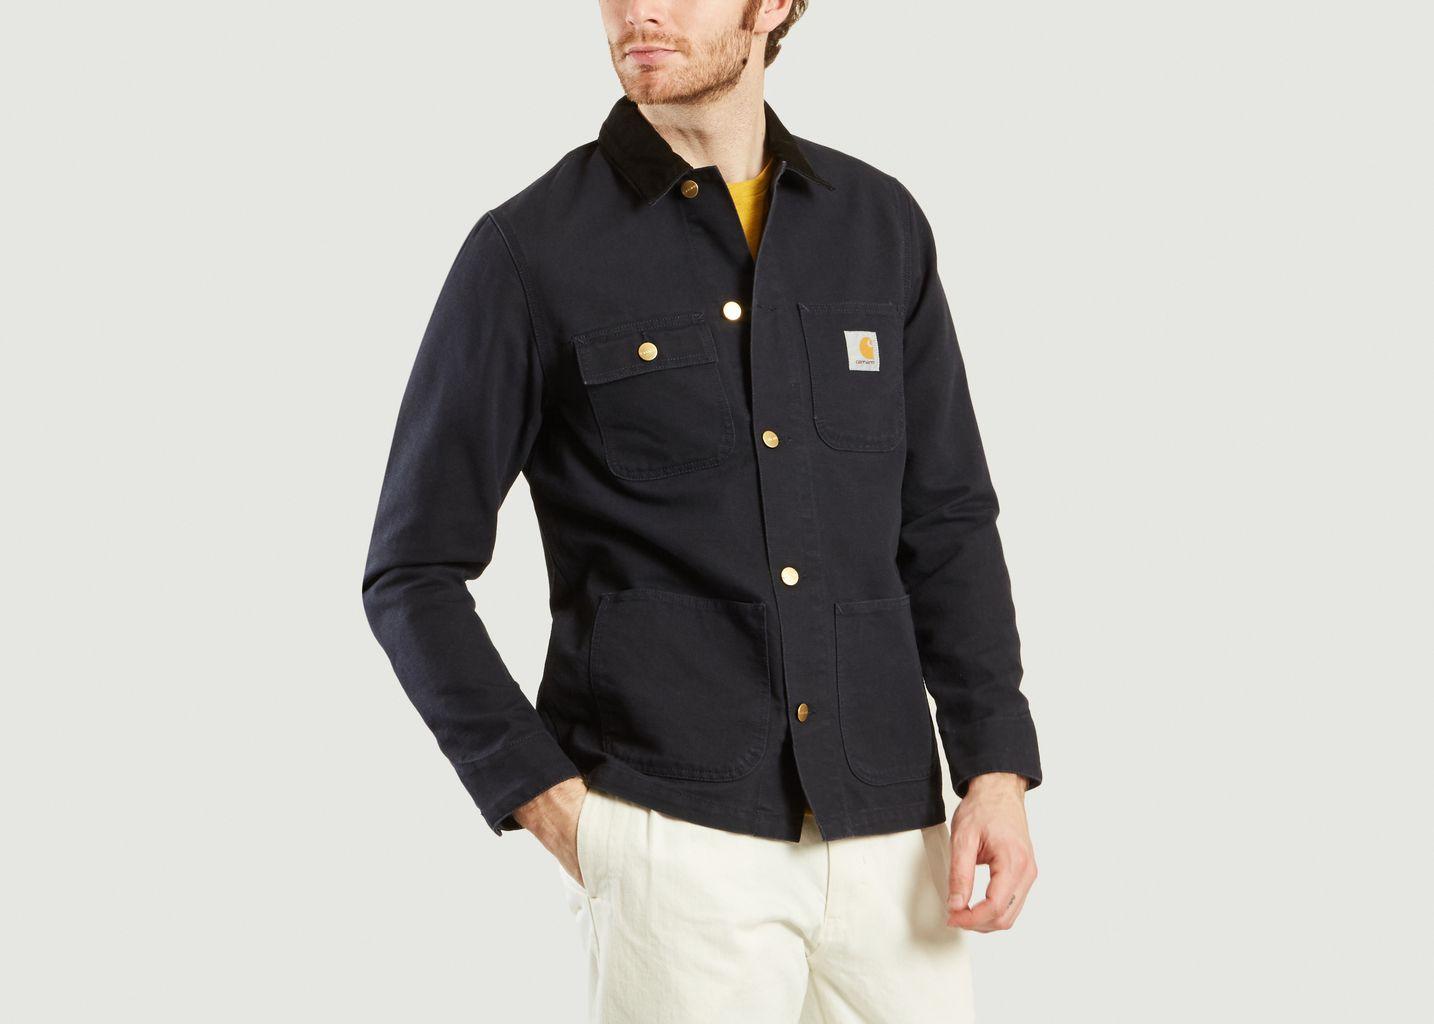 Michigan Jacket - Carhartt WIP